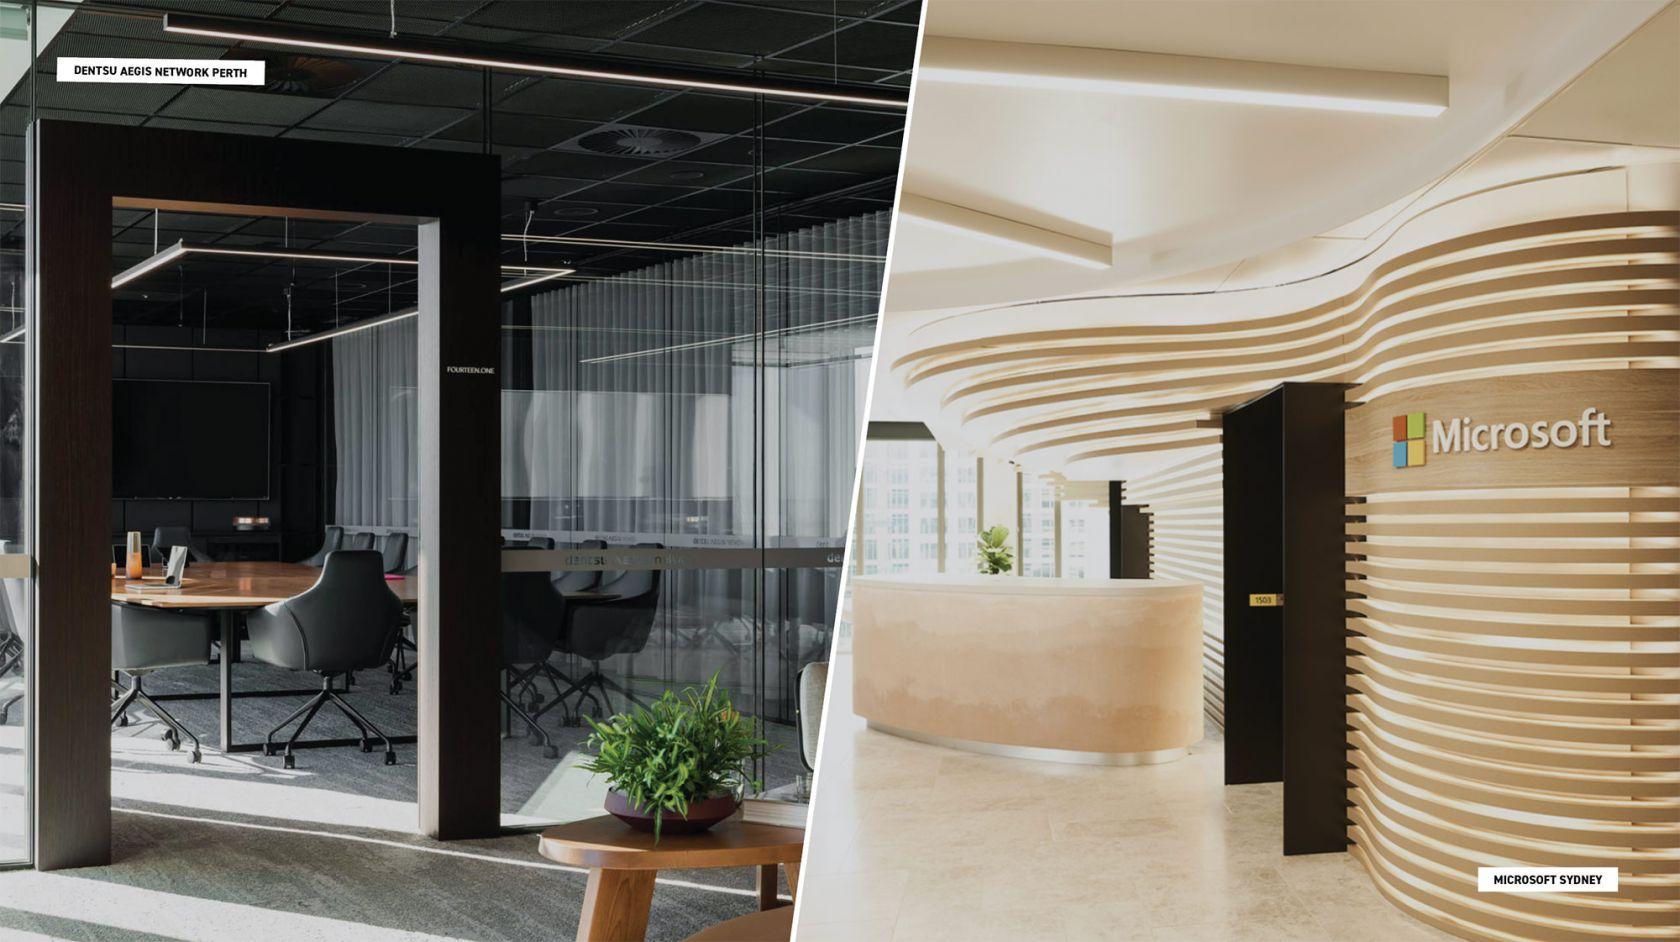 dentsu aegis office on left hand side of image and microsoft office on right hand side of image